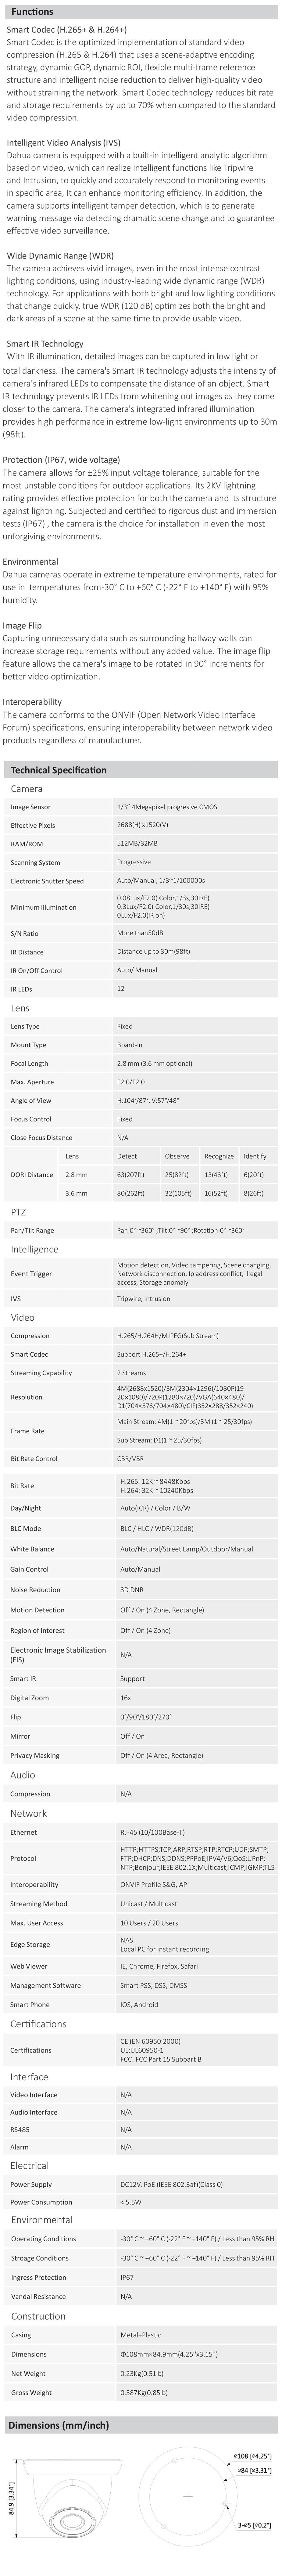 Dahua DH-IPC-HDW1431SP-036 4MP IR Eyeball Network Camera - Overview 1